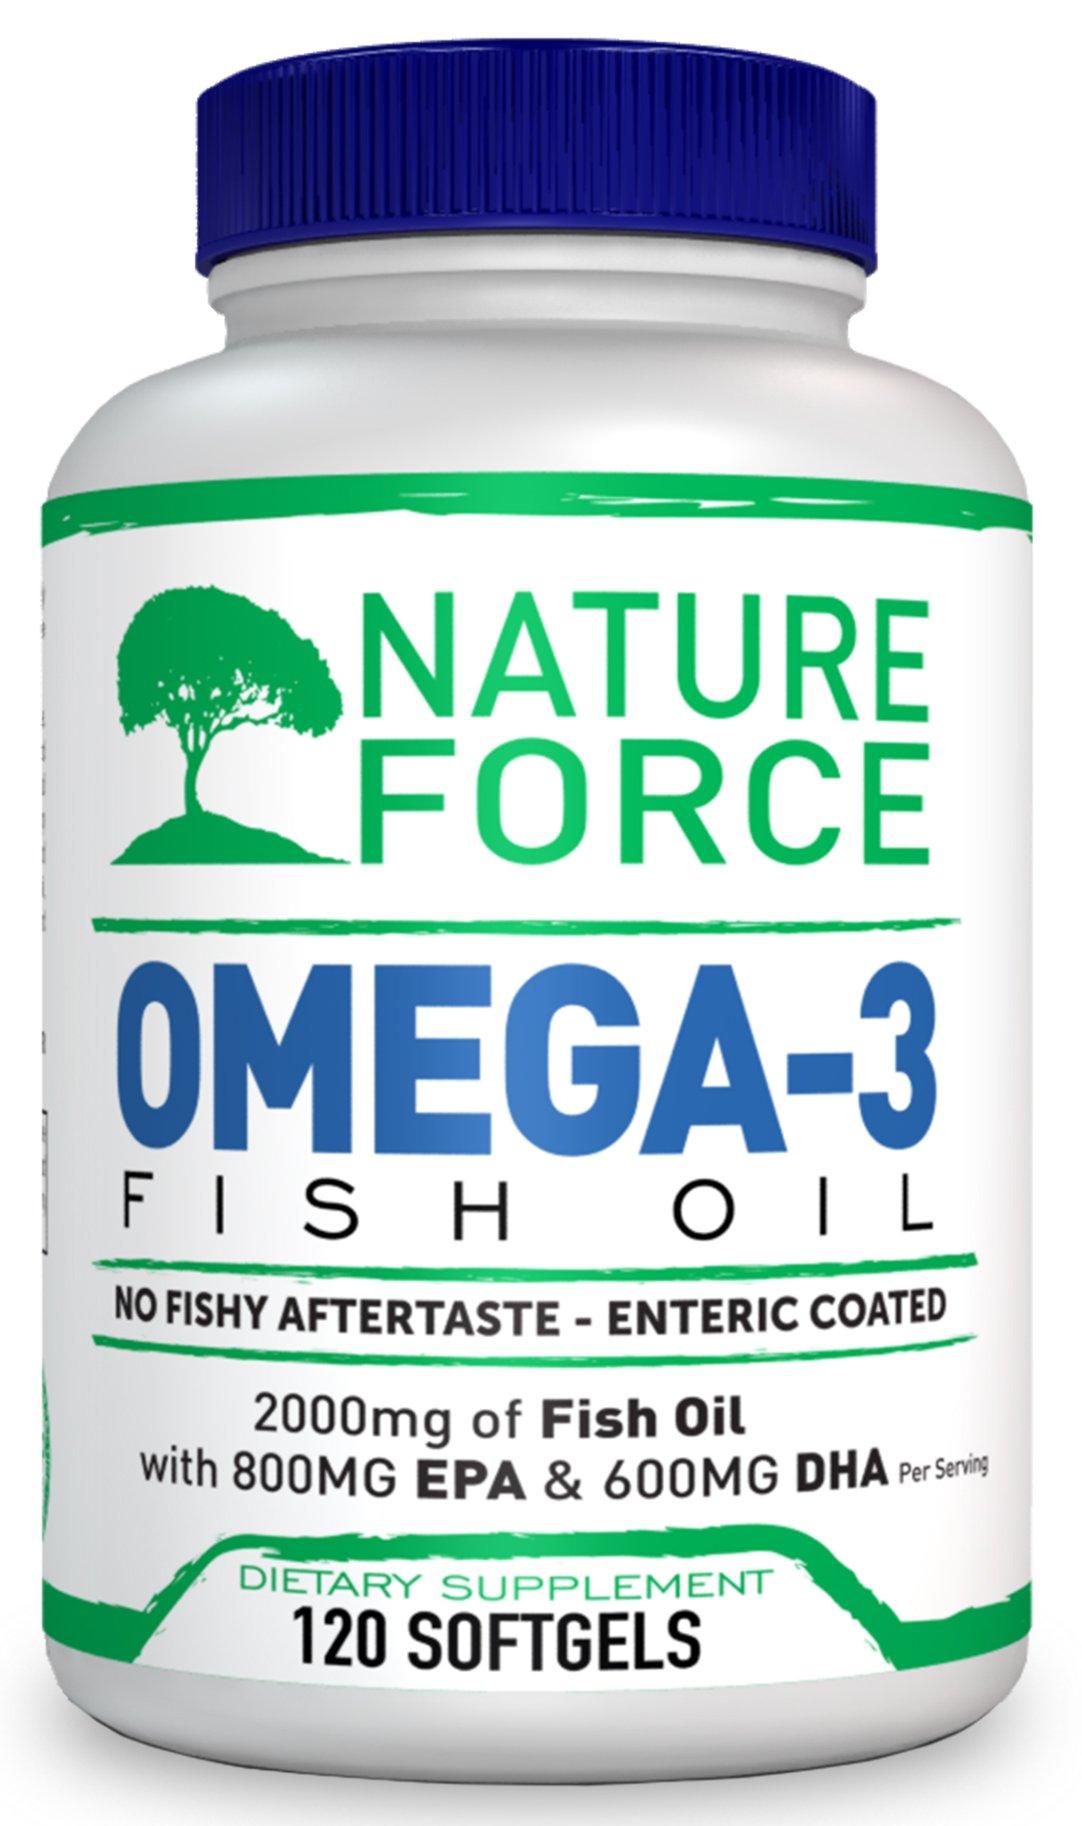 Nature Force Omega 3 Fish Oil 2000mg EPA 800mg + DHA 600mg Triple Strength Burpless No Fishy Aftertaste 120 Capsules